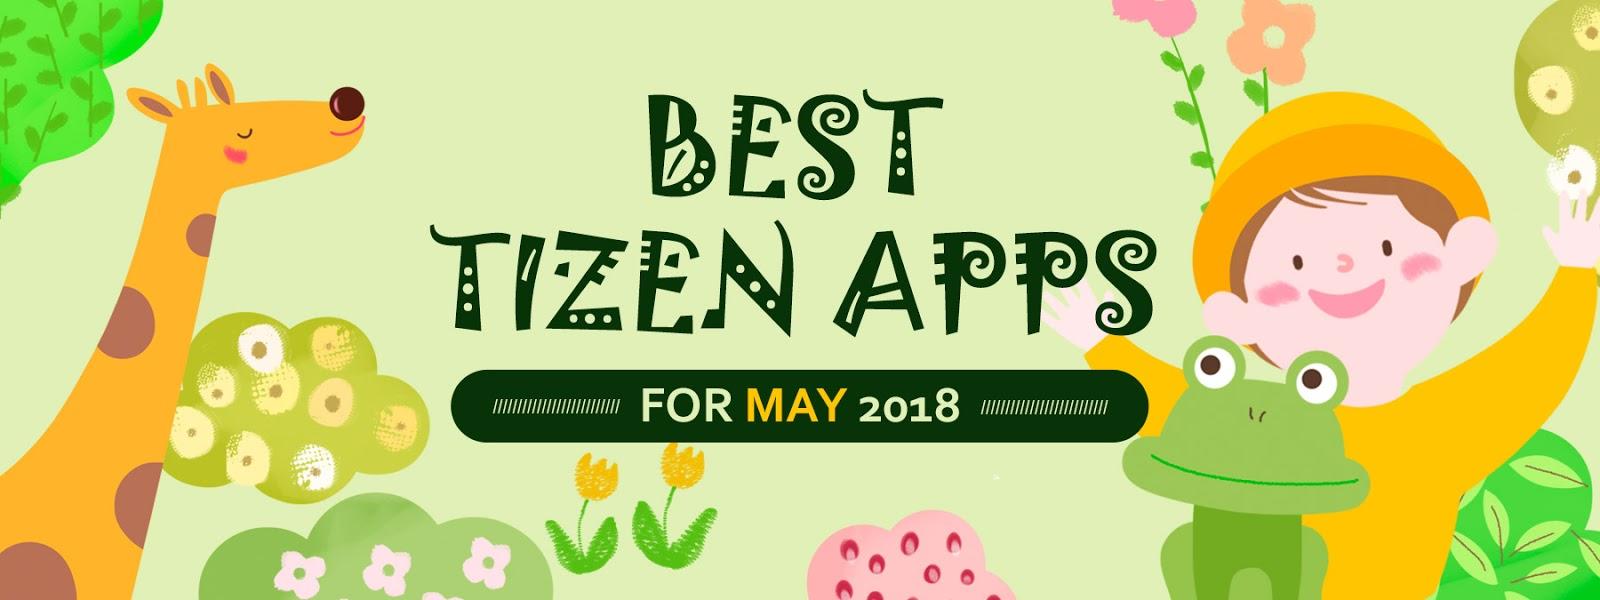 20 Aplikasi Terlaris di Tizen Store bulan Mei 2018